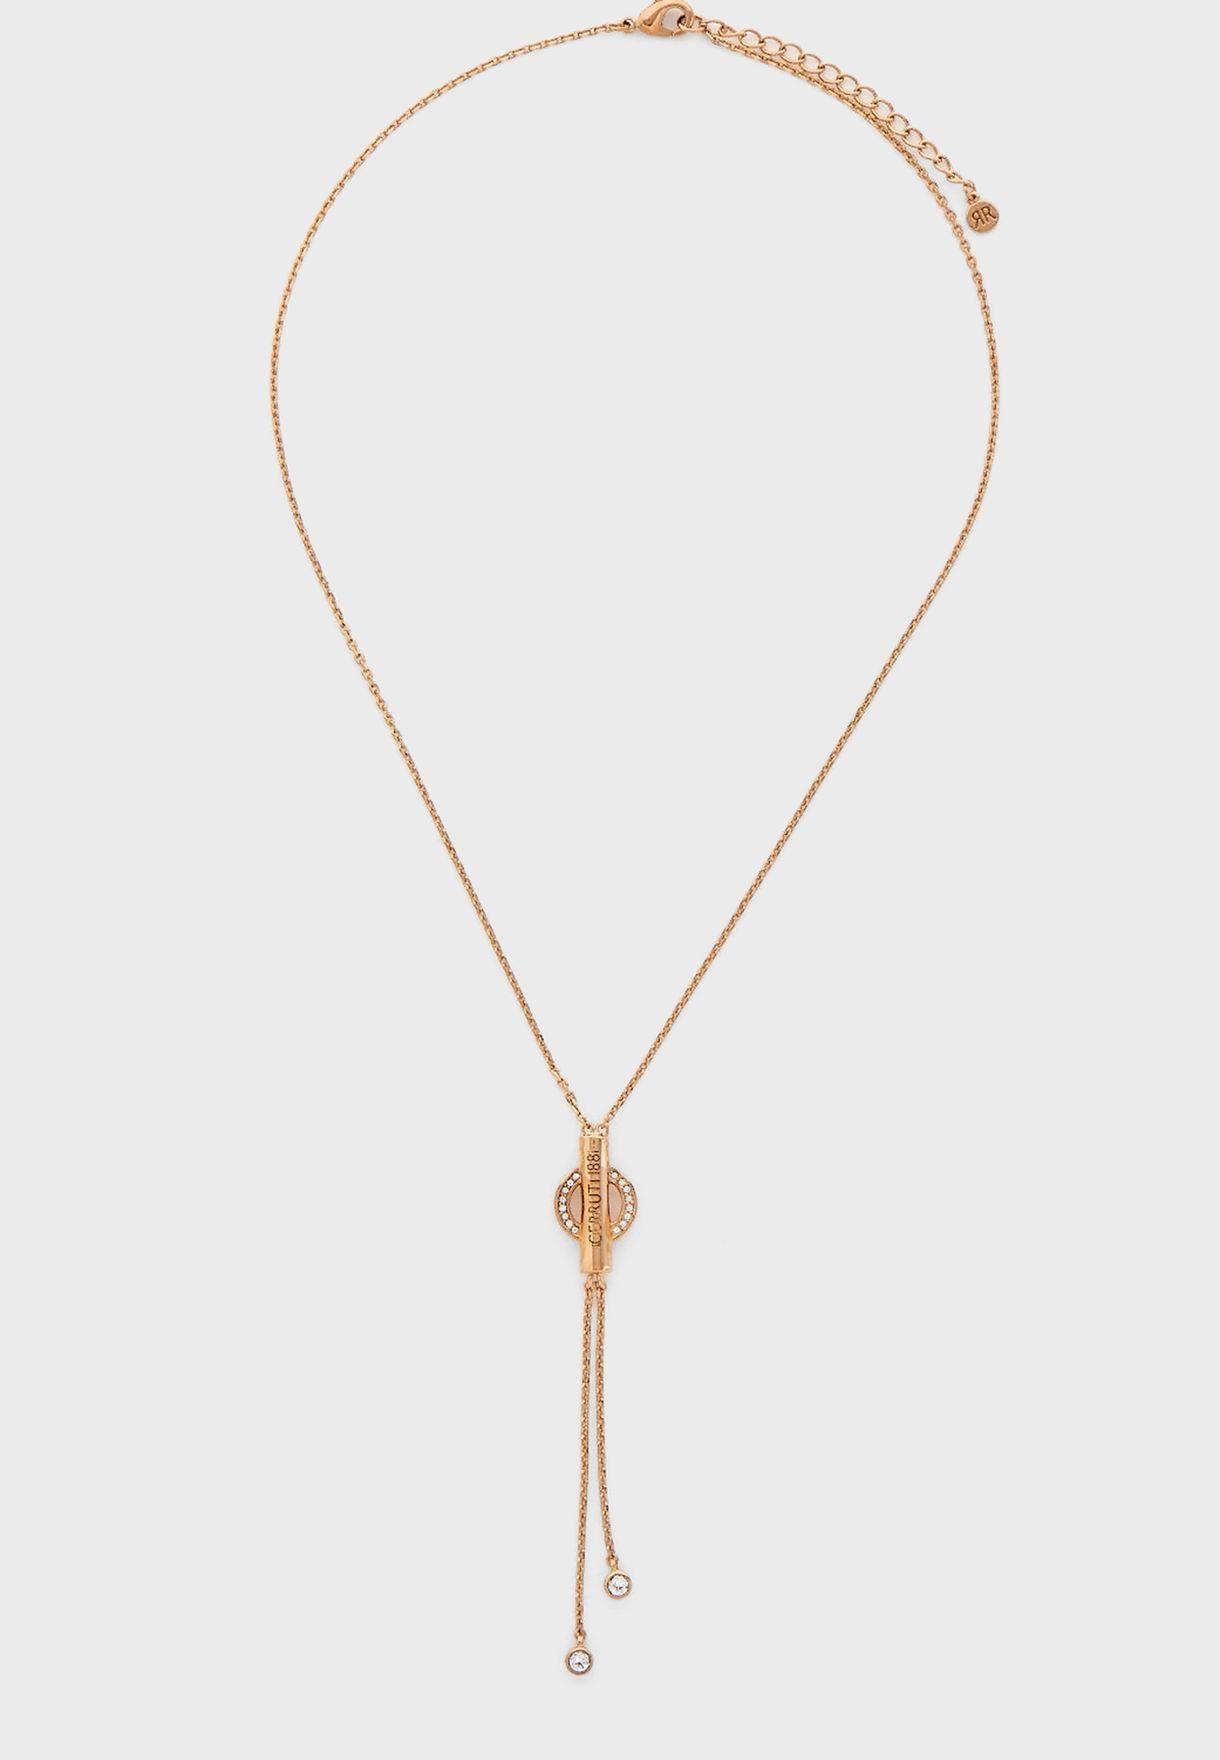 C Crj N221Sr Necklace